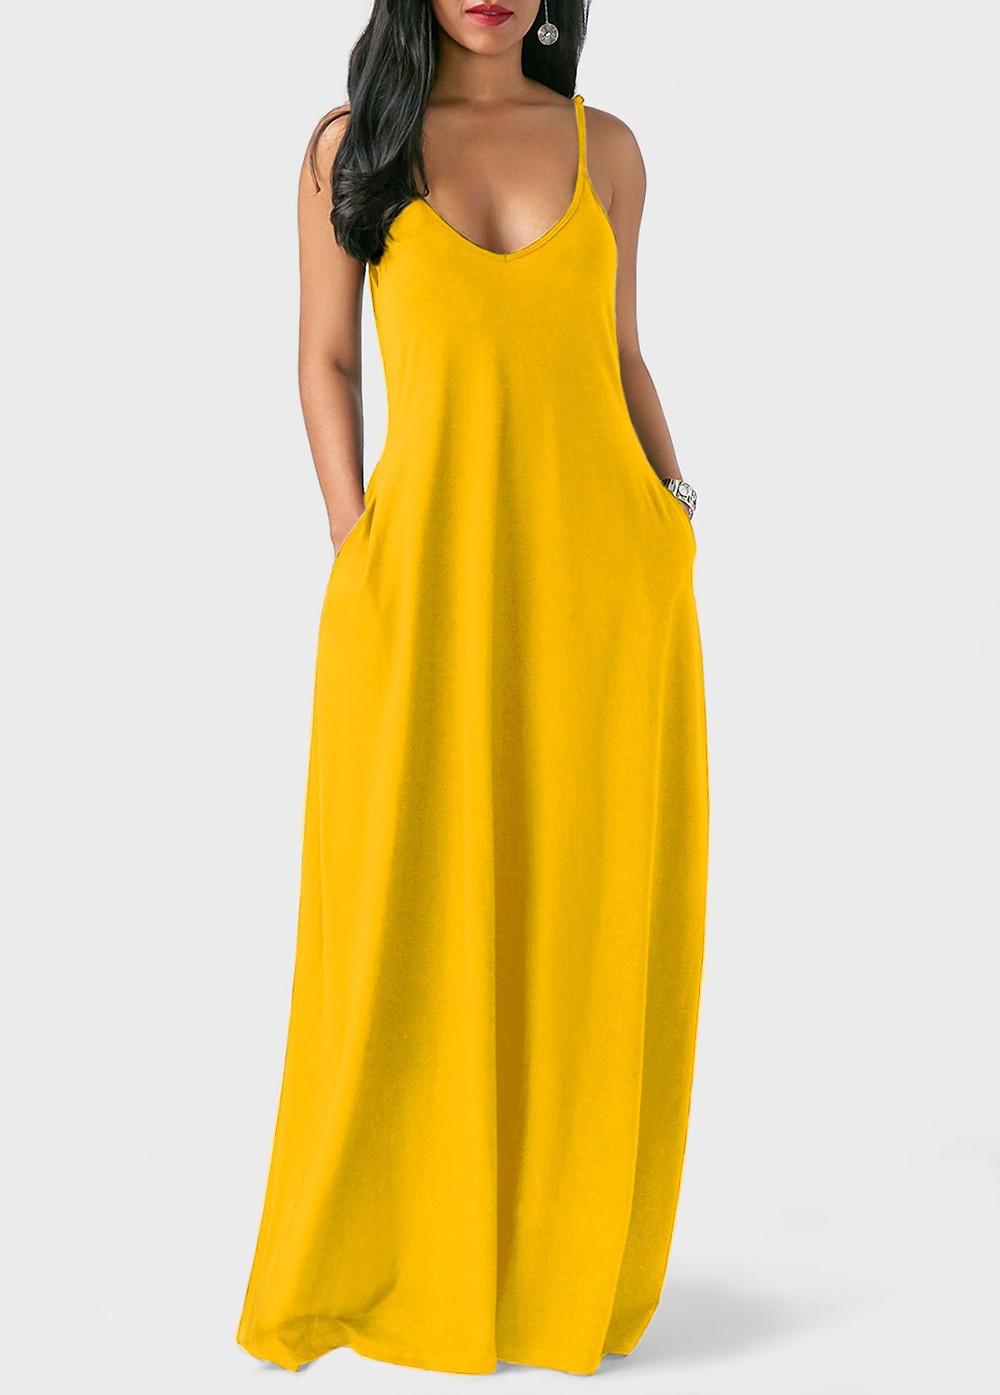 Woman wearing yellow spaghetti strap maxi dress from Roswe